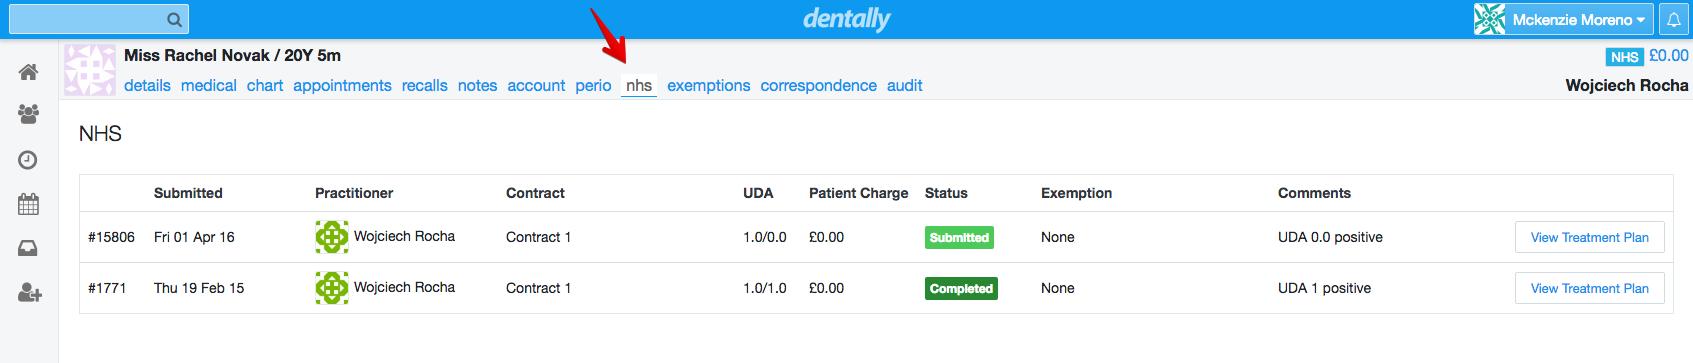 Dentally - Dental Software - NHS